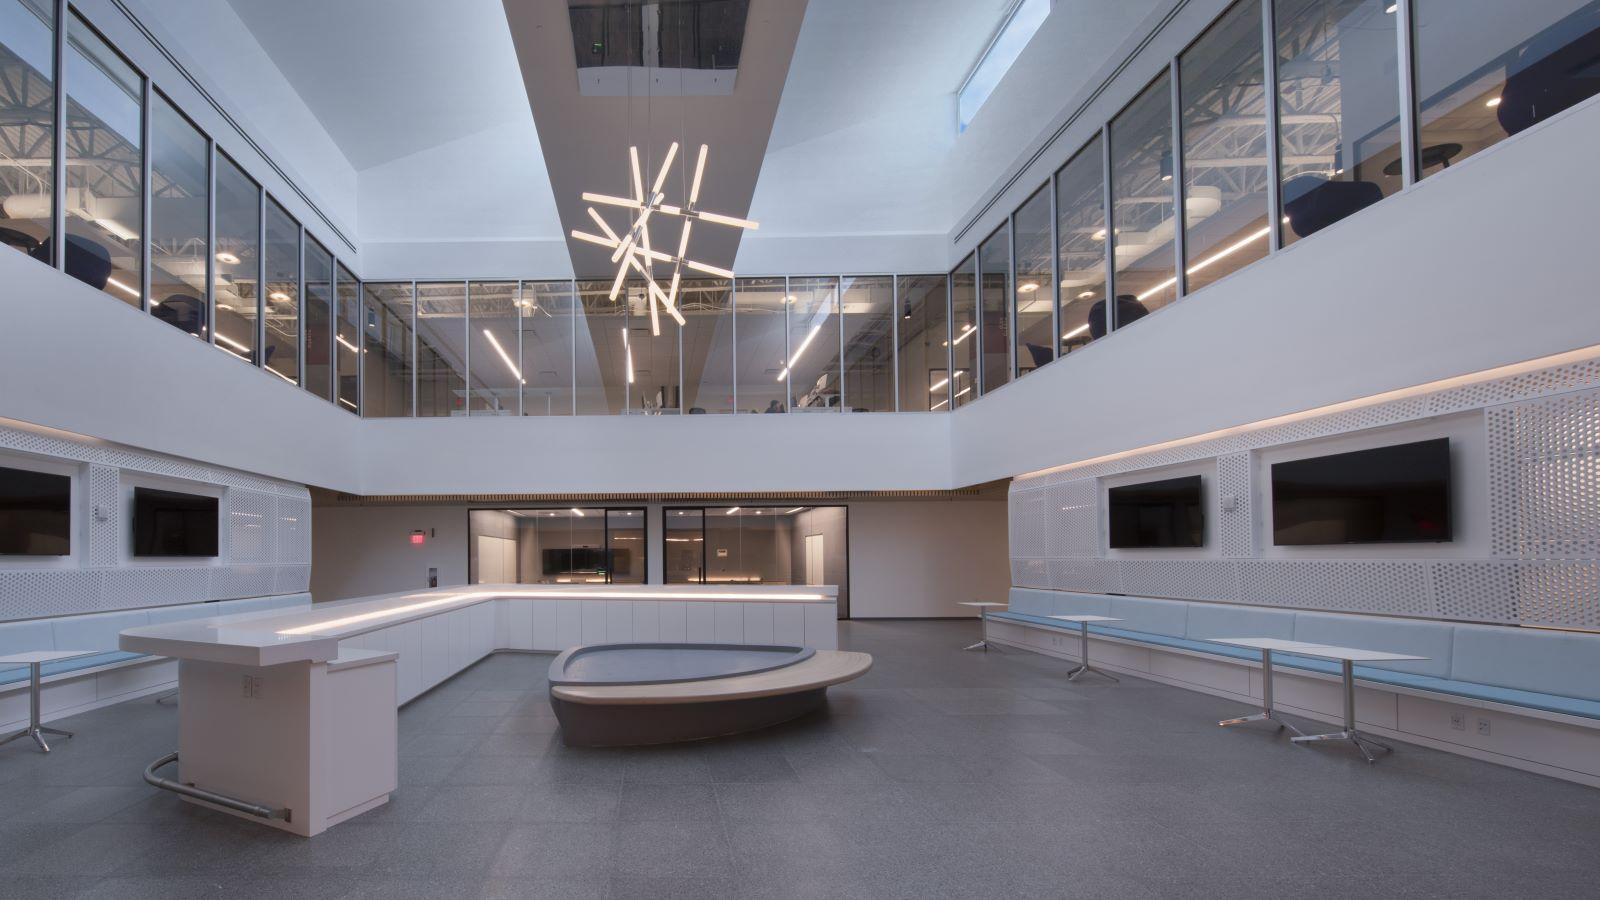 Telemundo Luxury Modern Interior, Collaborative Campus - Mace Group